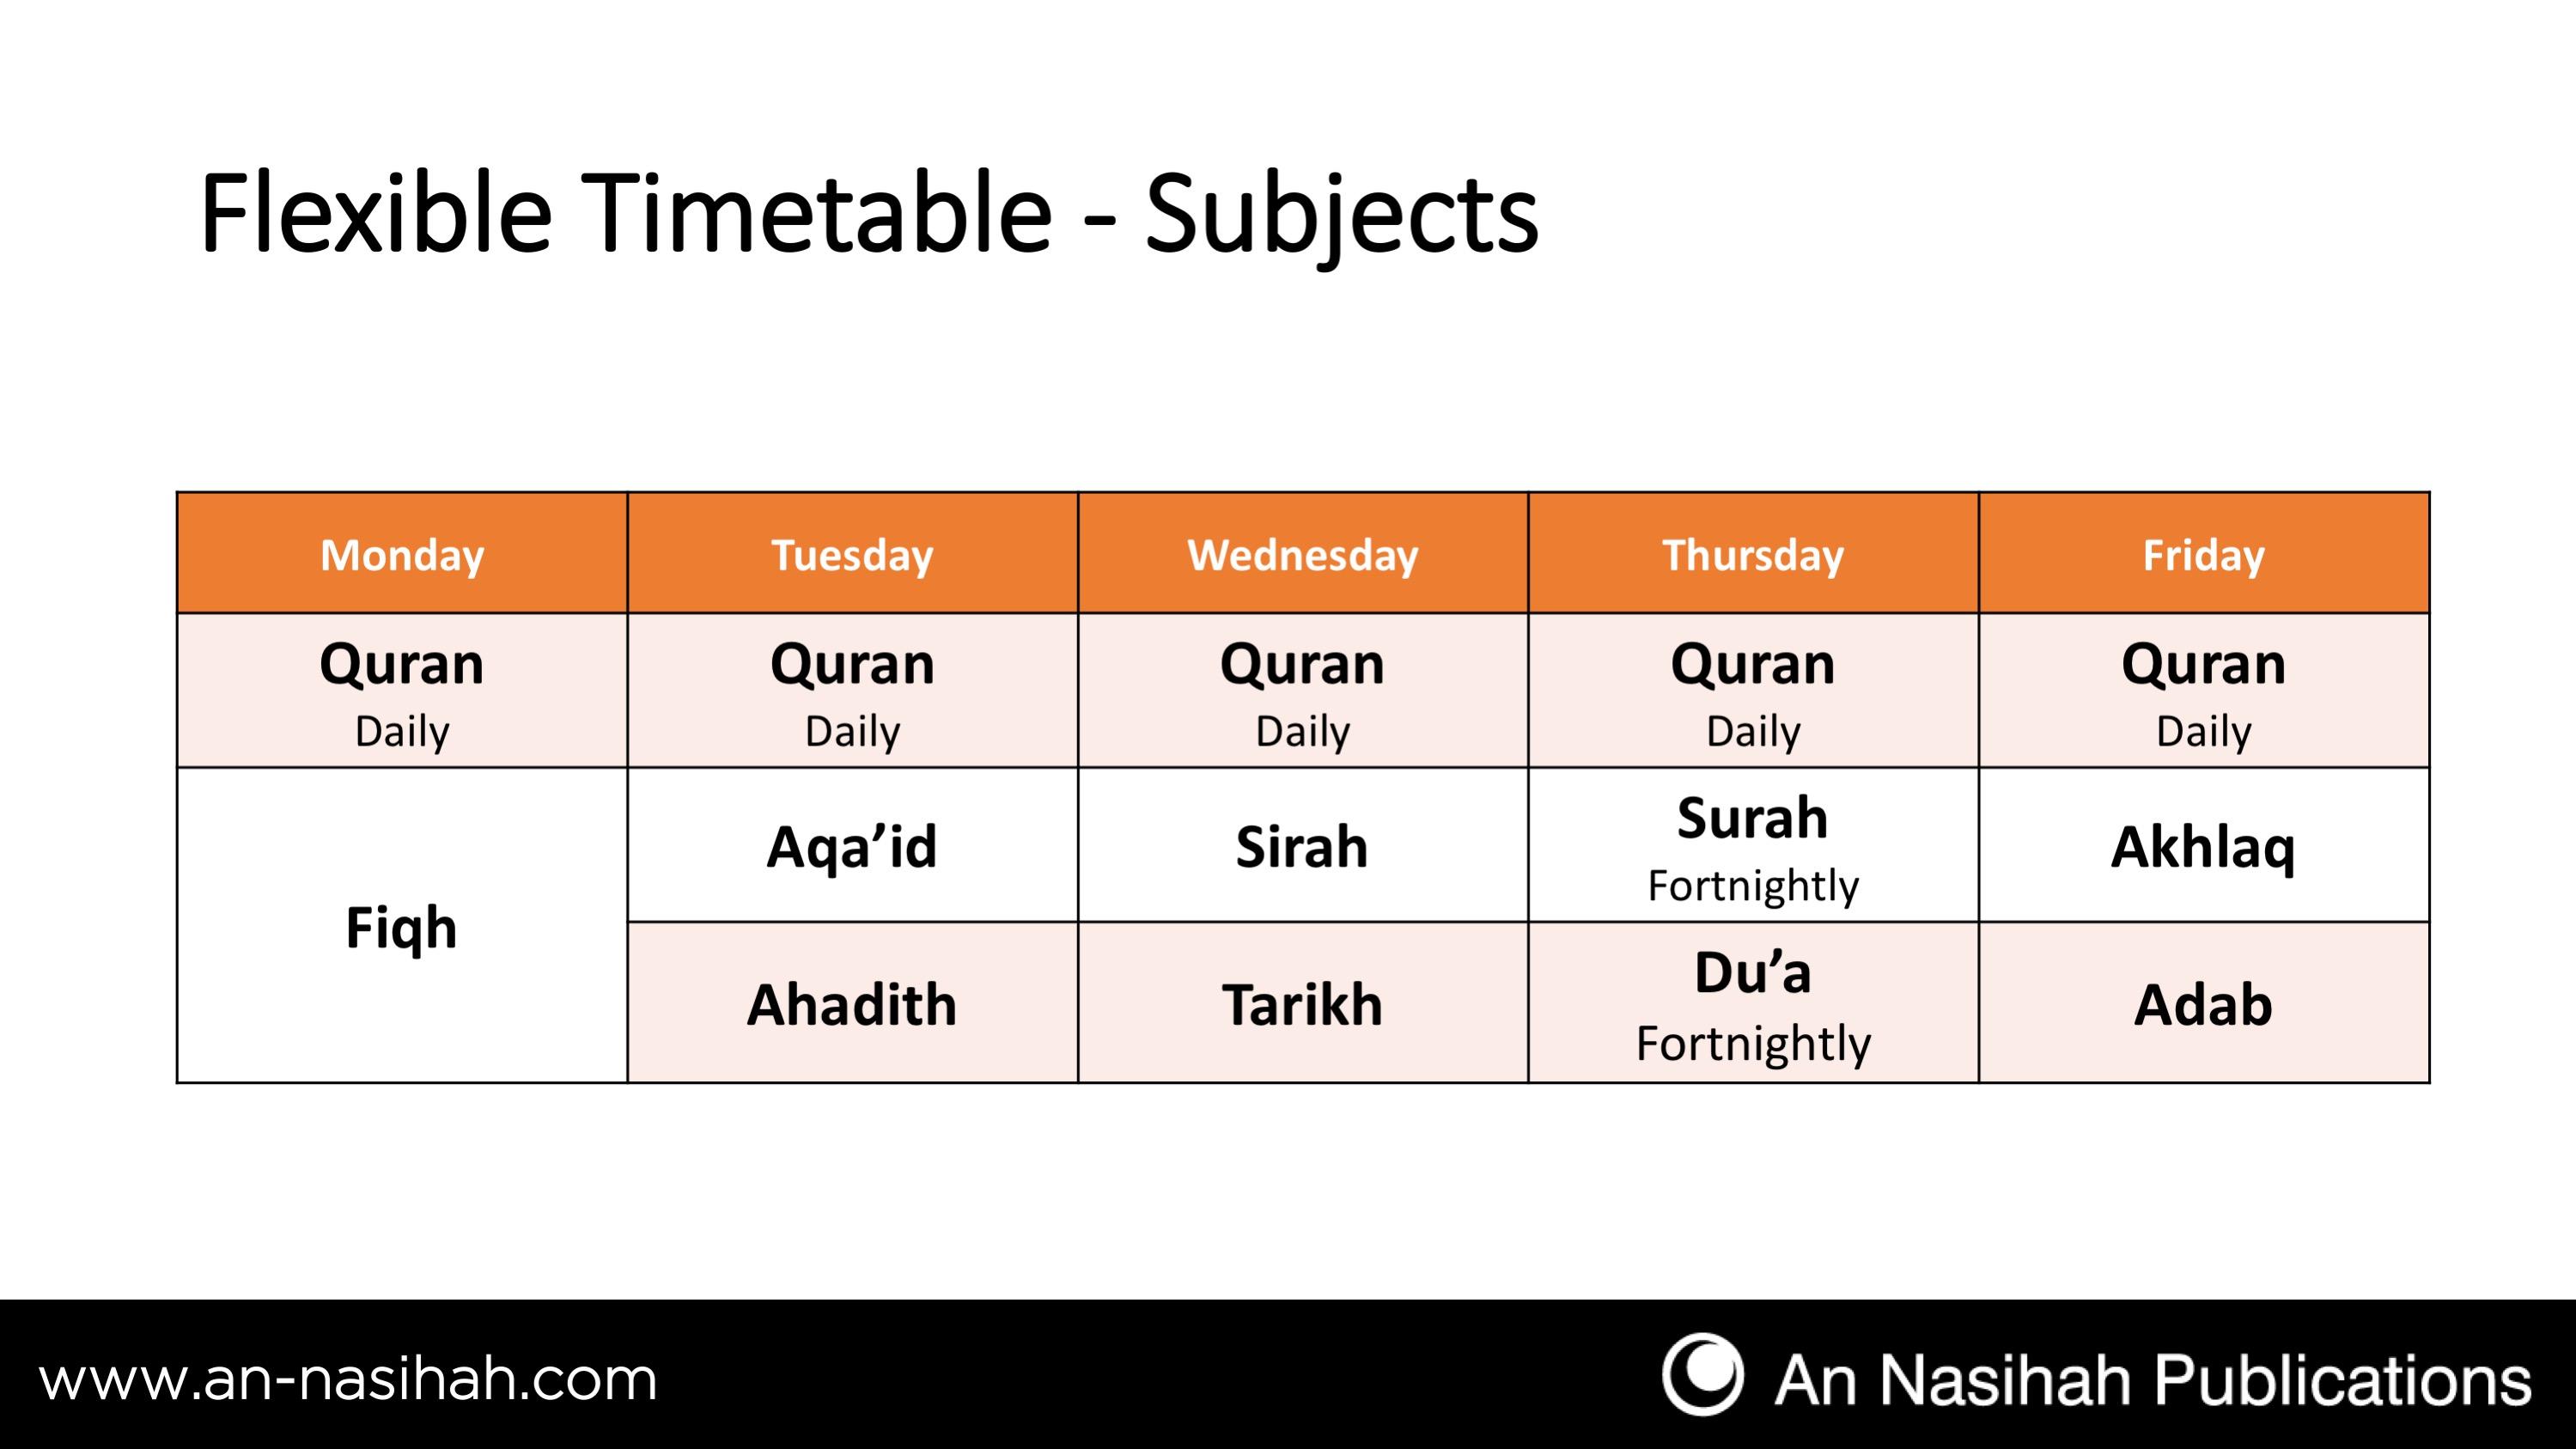 Timetable | An Nasihah Publications